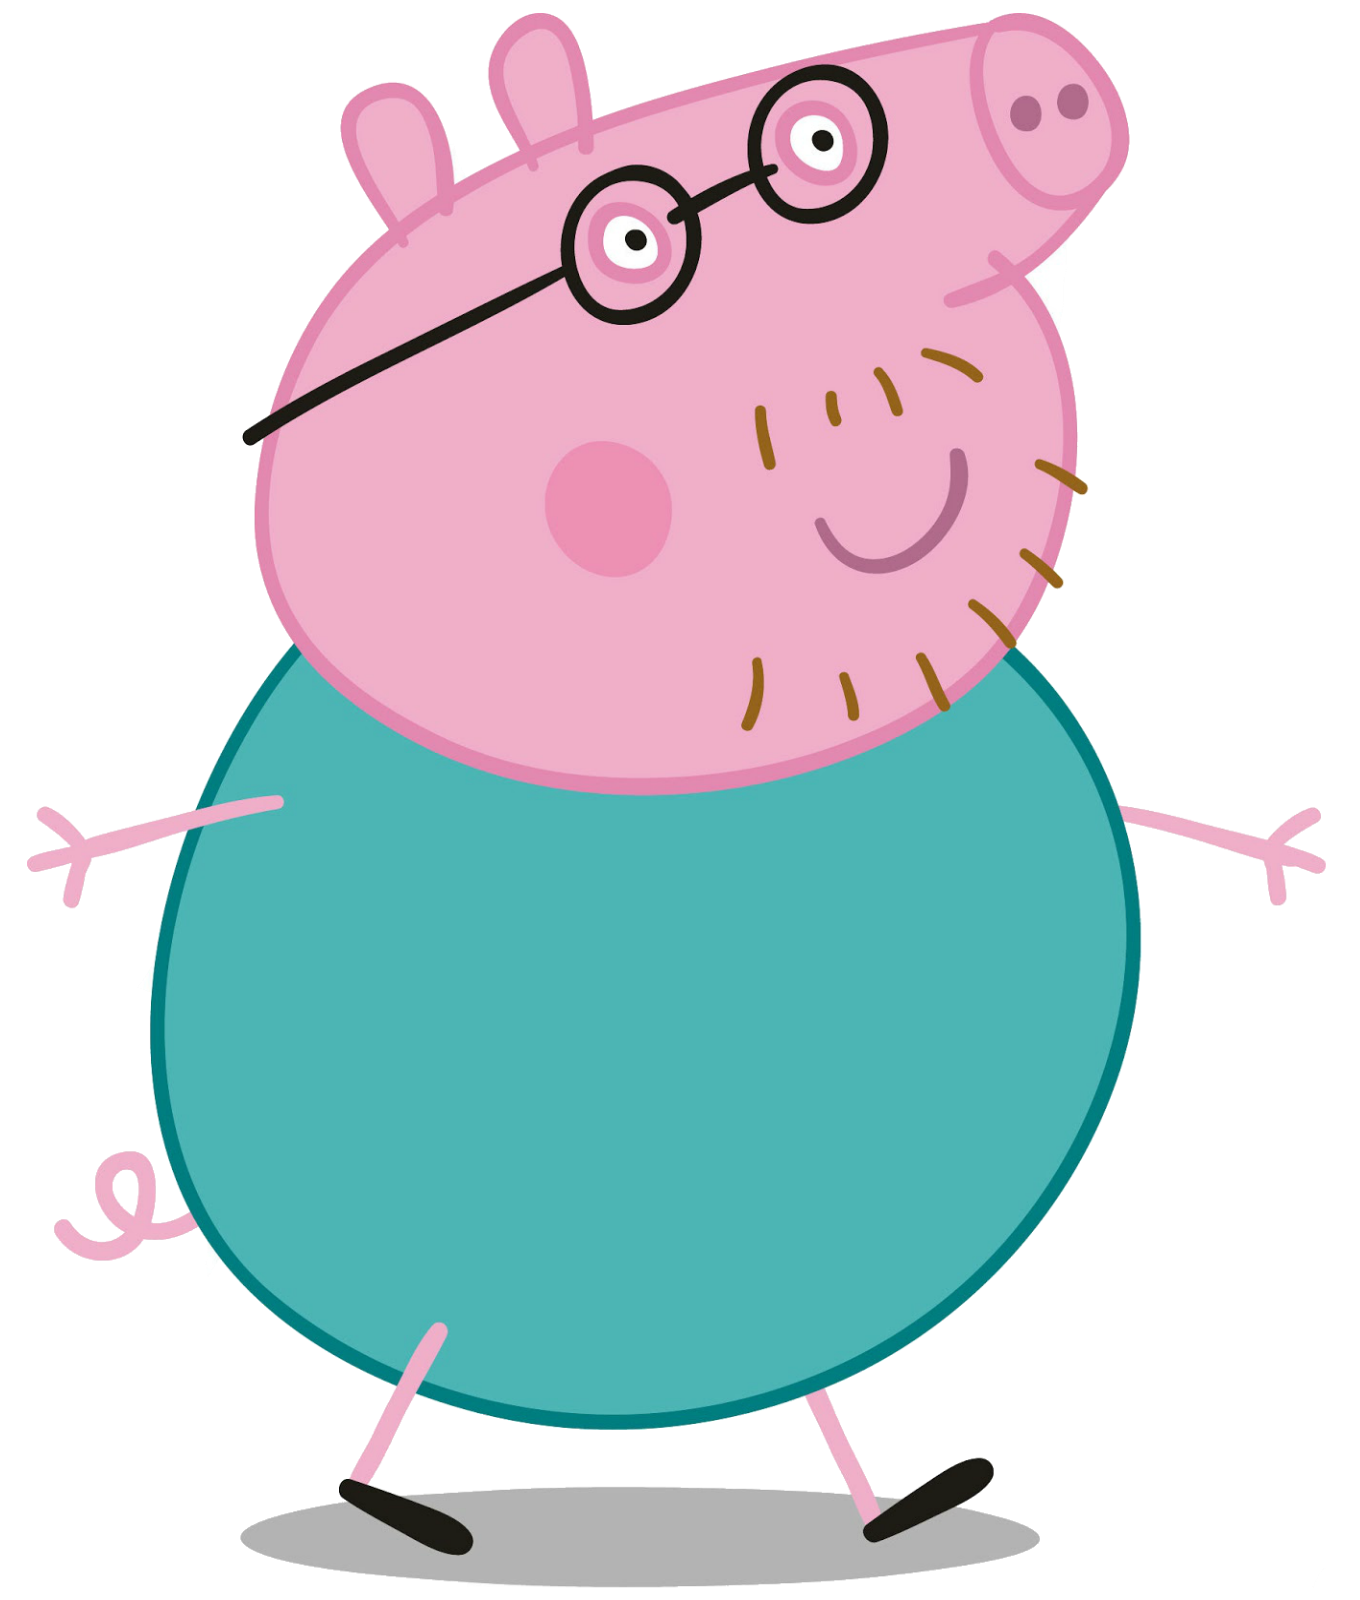 families clipart pig